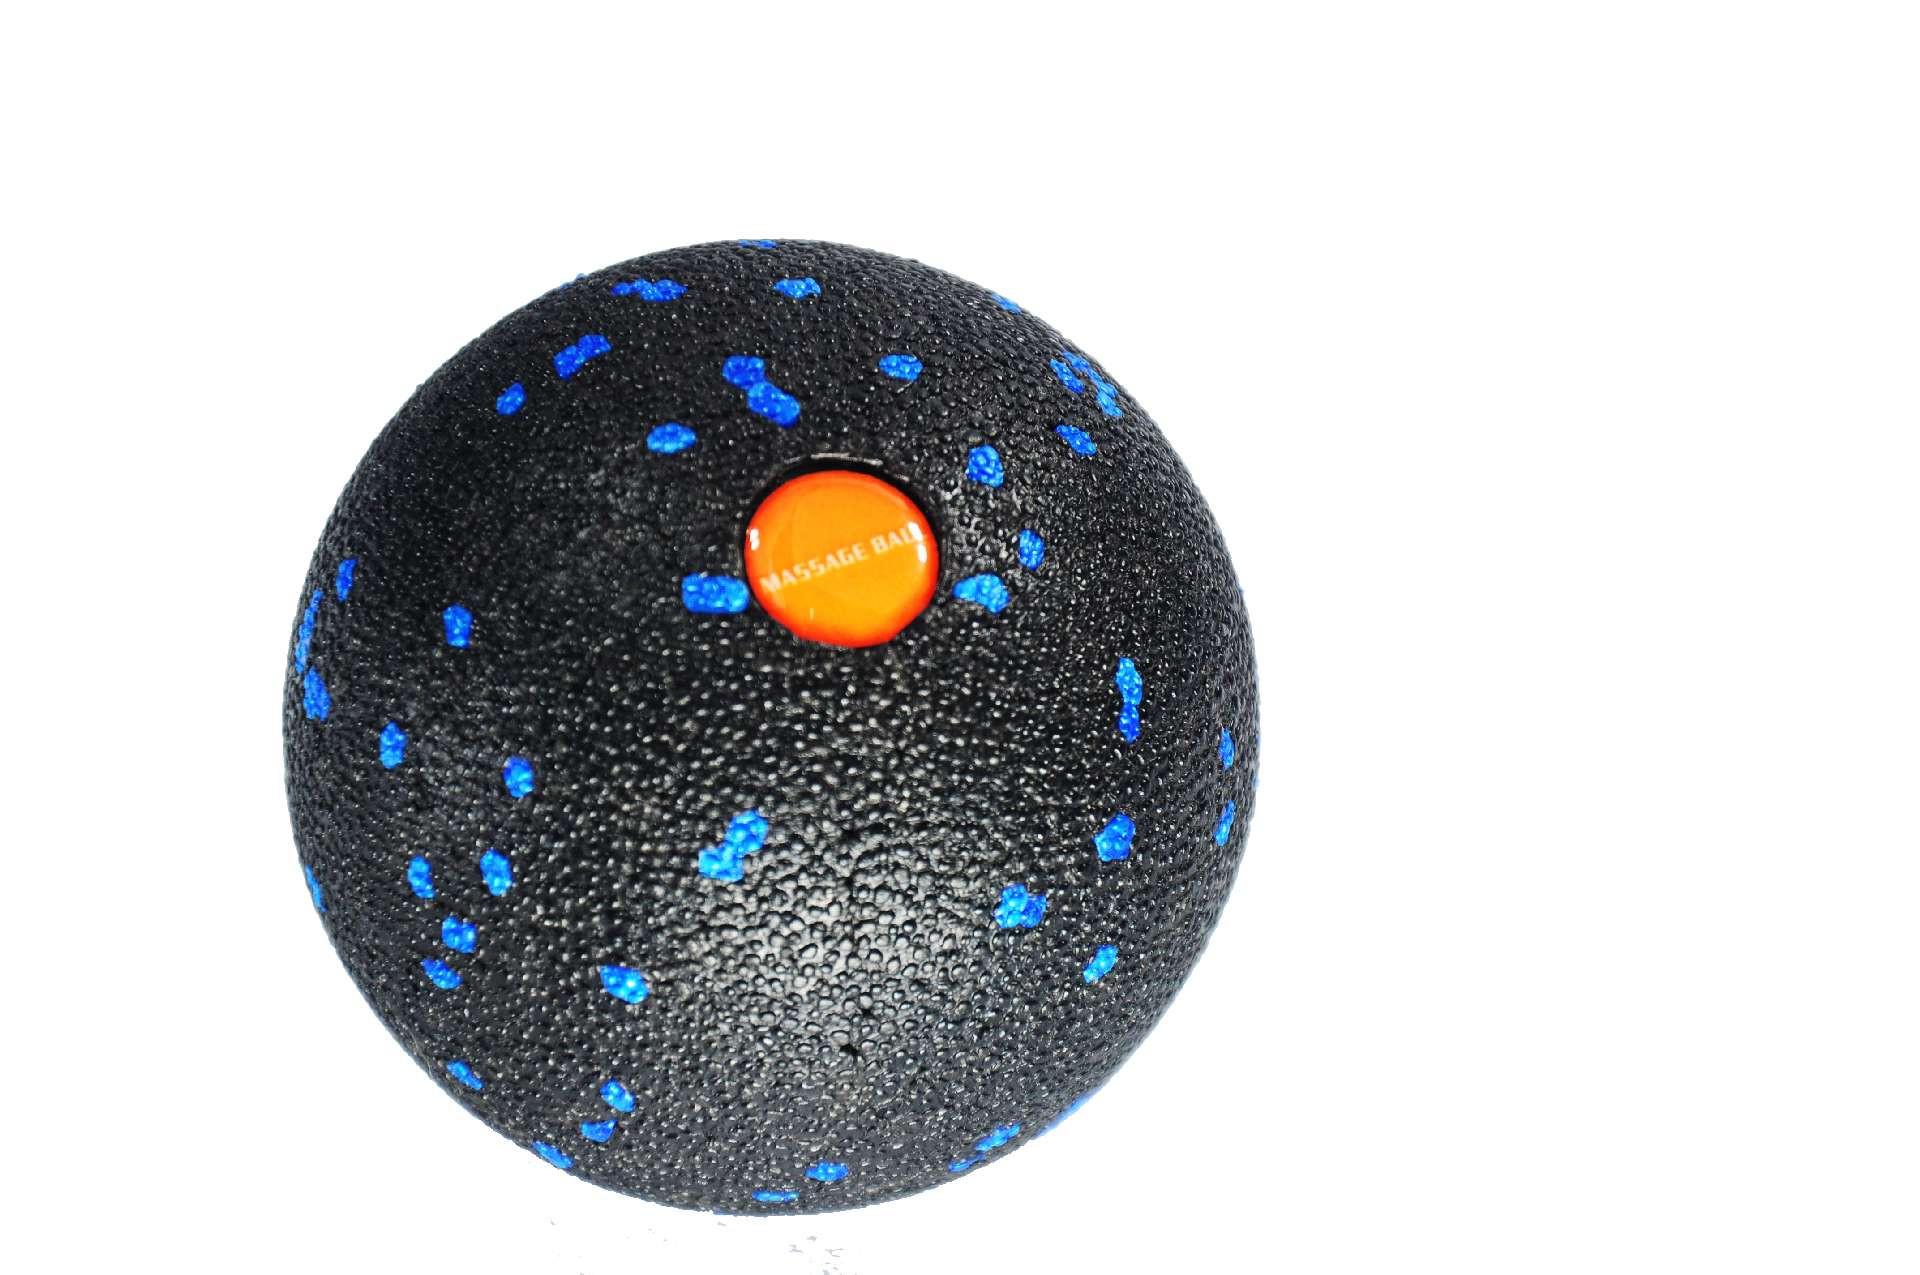 Zestaw EPP Wałek Roller do masażu + Piłka + Doubleball ProShape